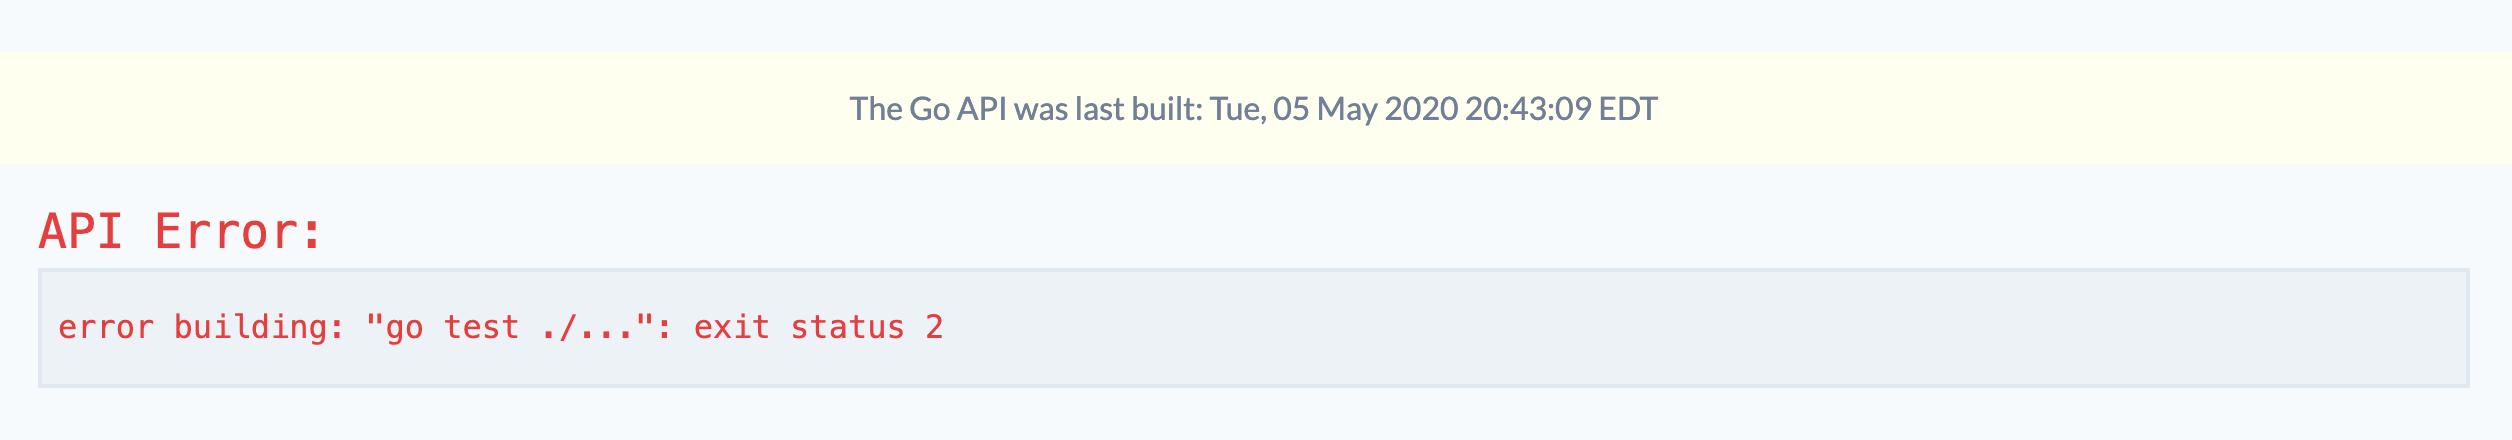 Screenshot of the error rendering in the React UI.